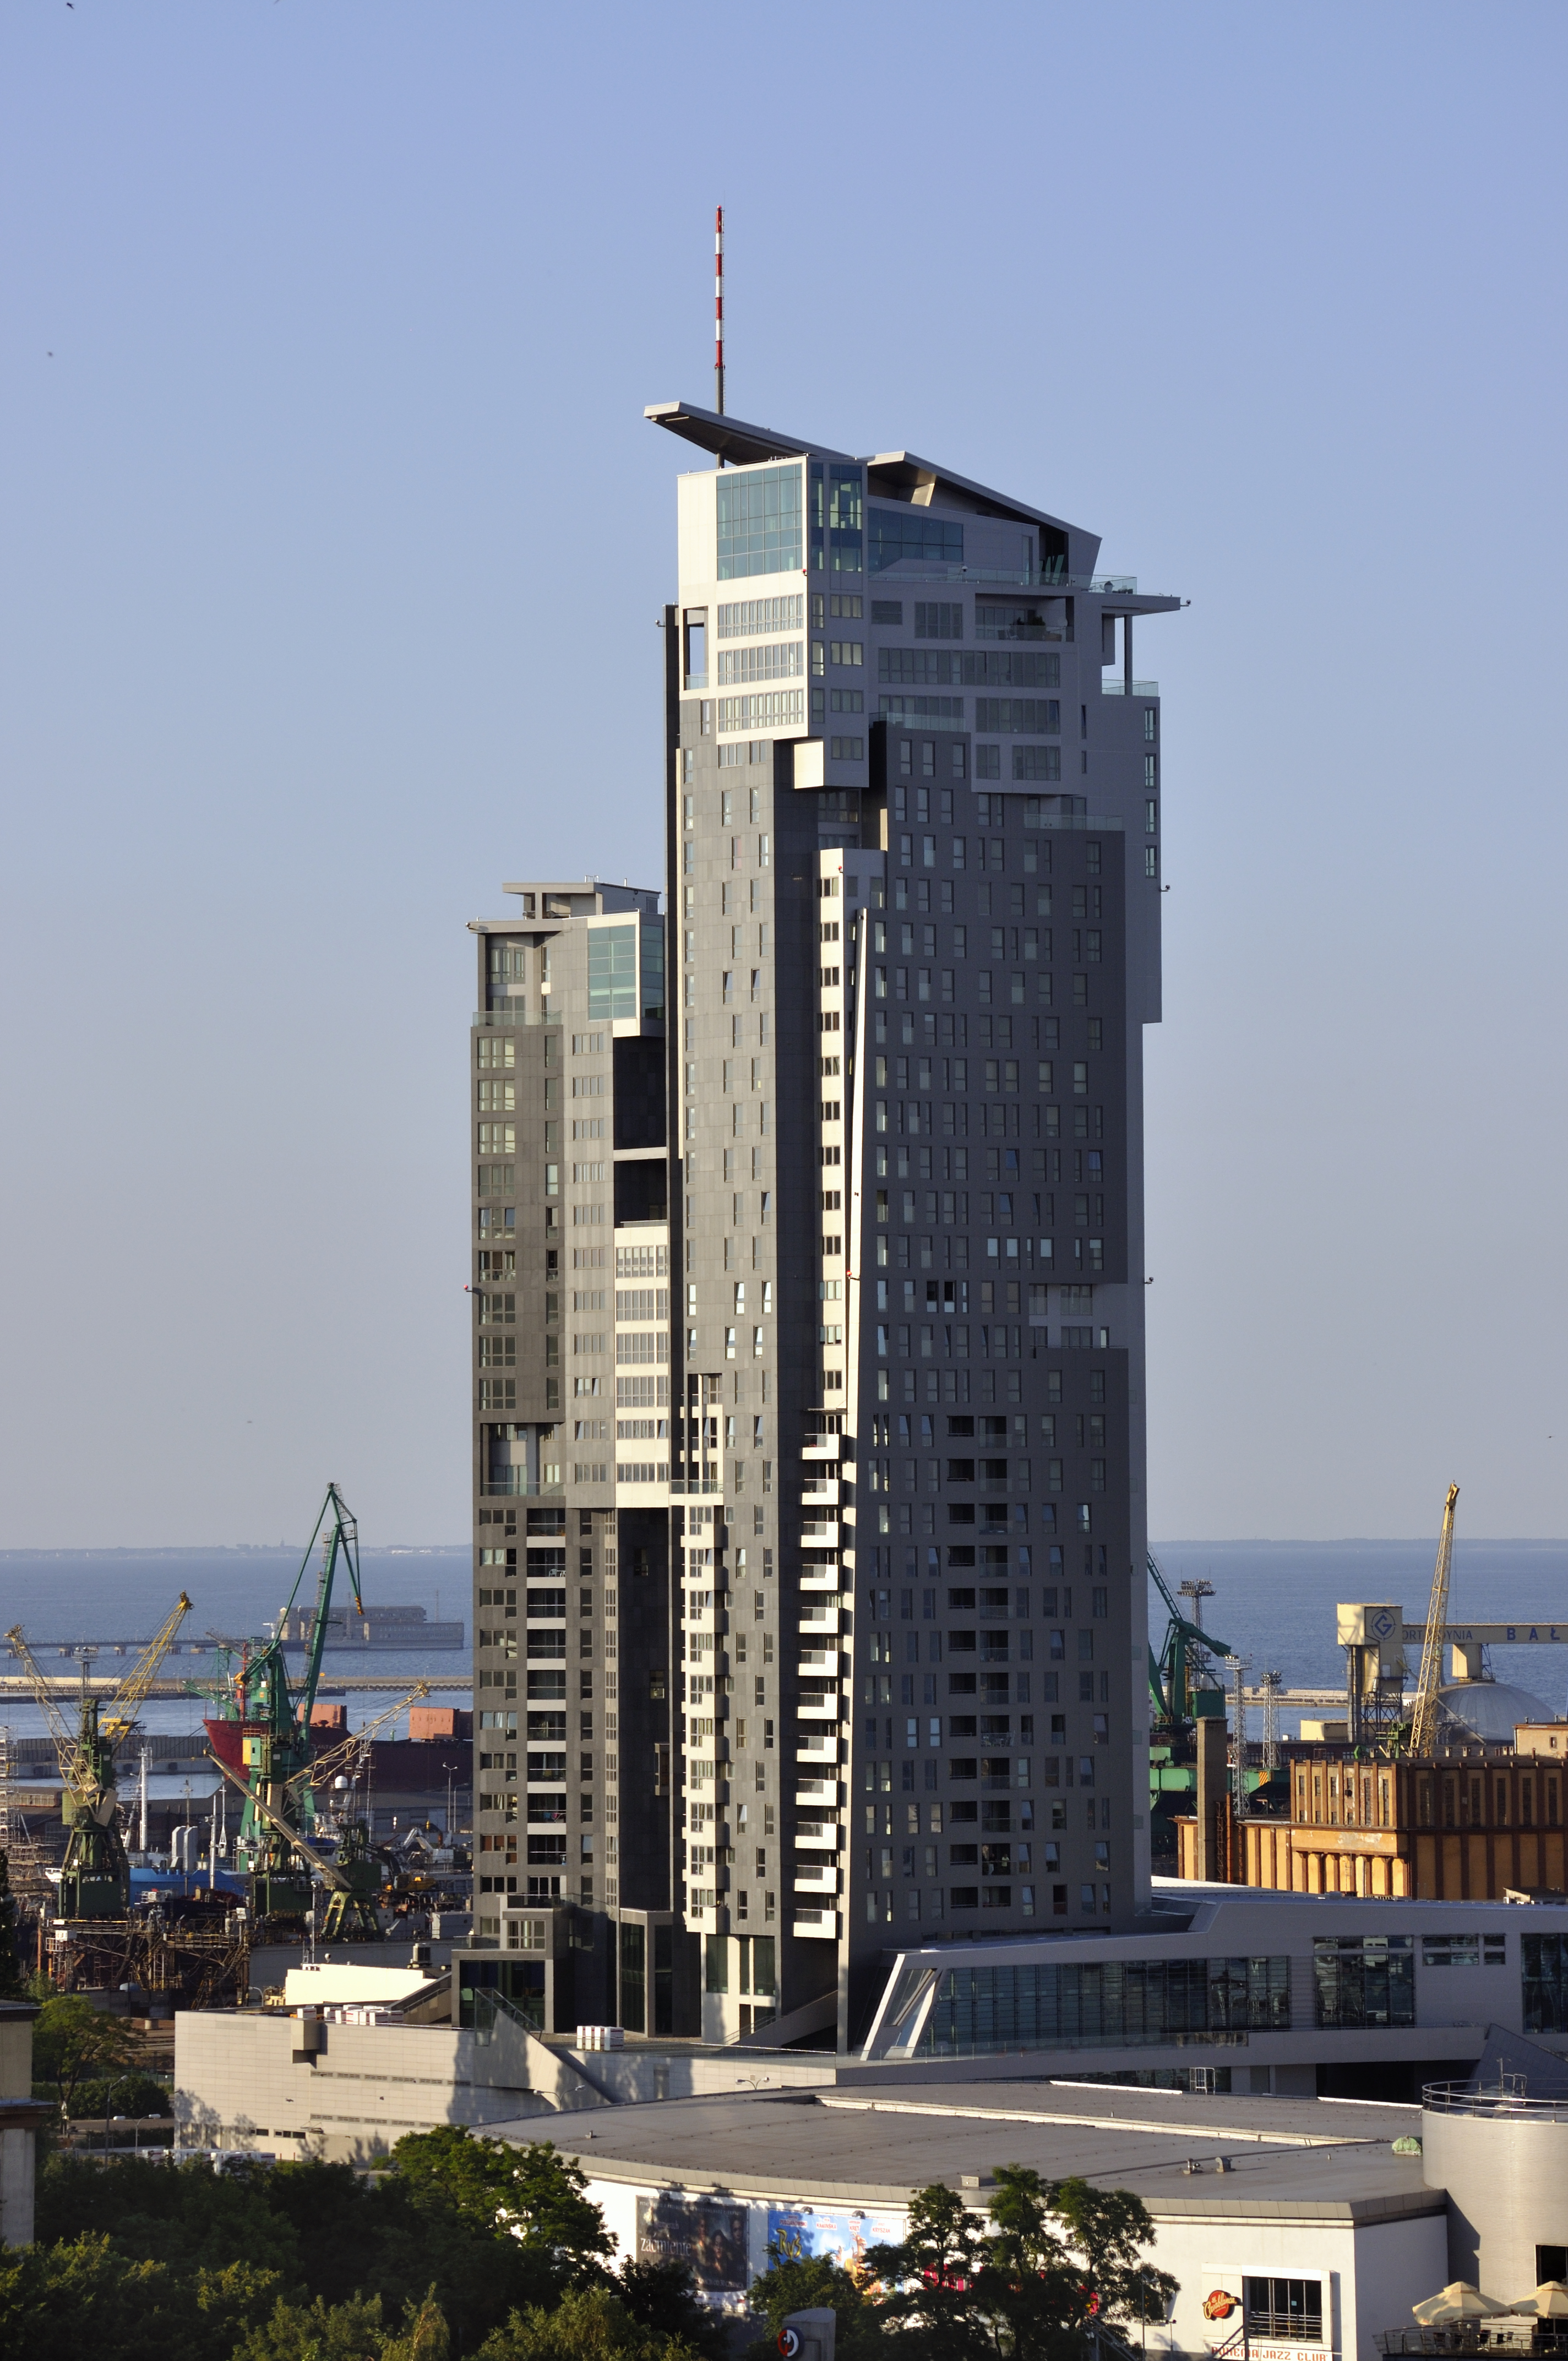 7e0bdeadf Gdynia – Wikipedia, wolna encyklopedia